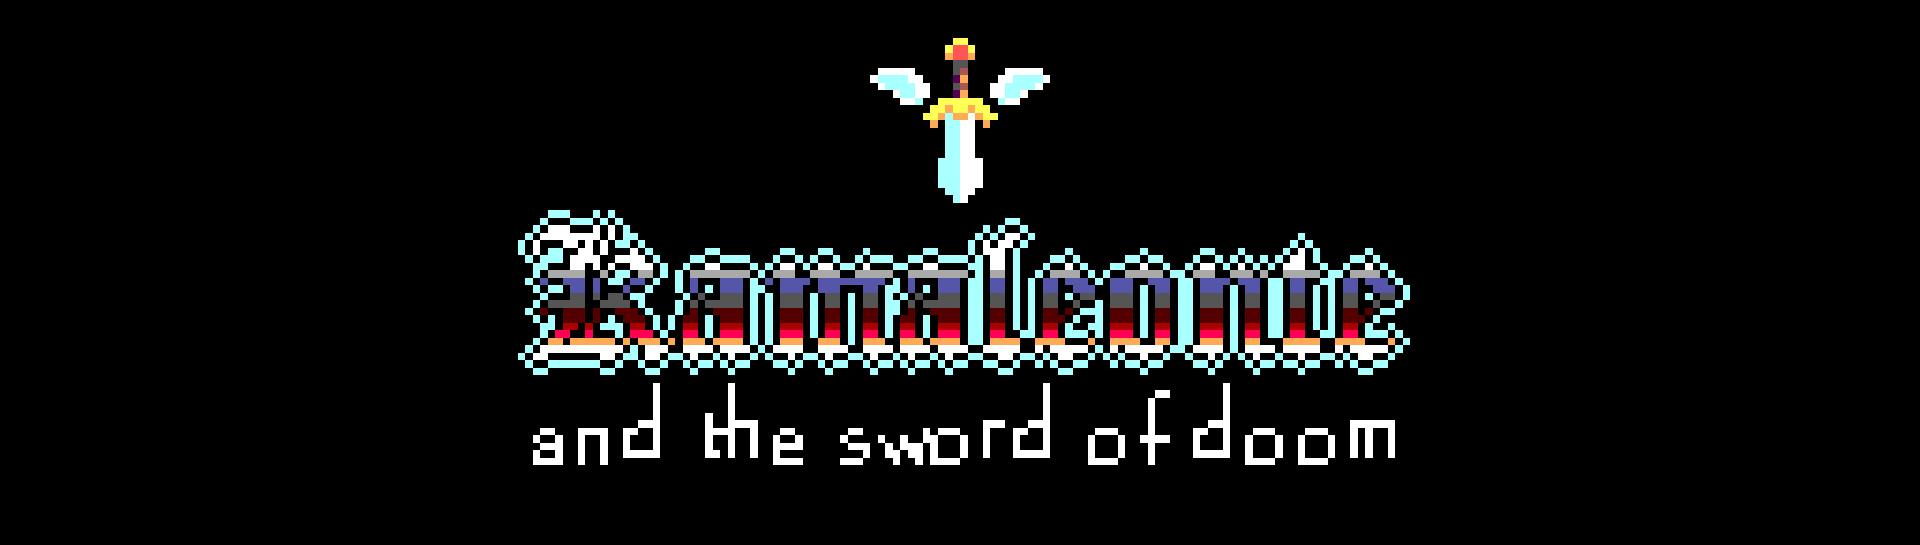 Kamaleonte and the sword of Doom